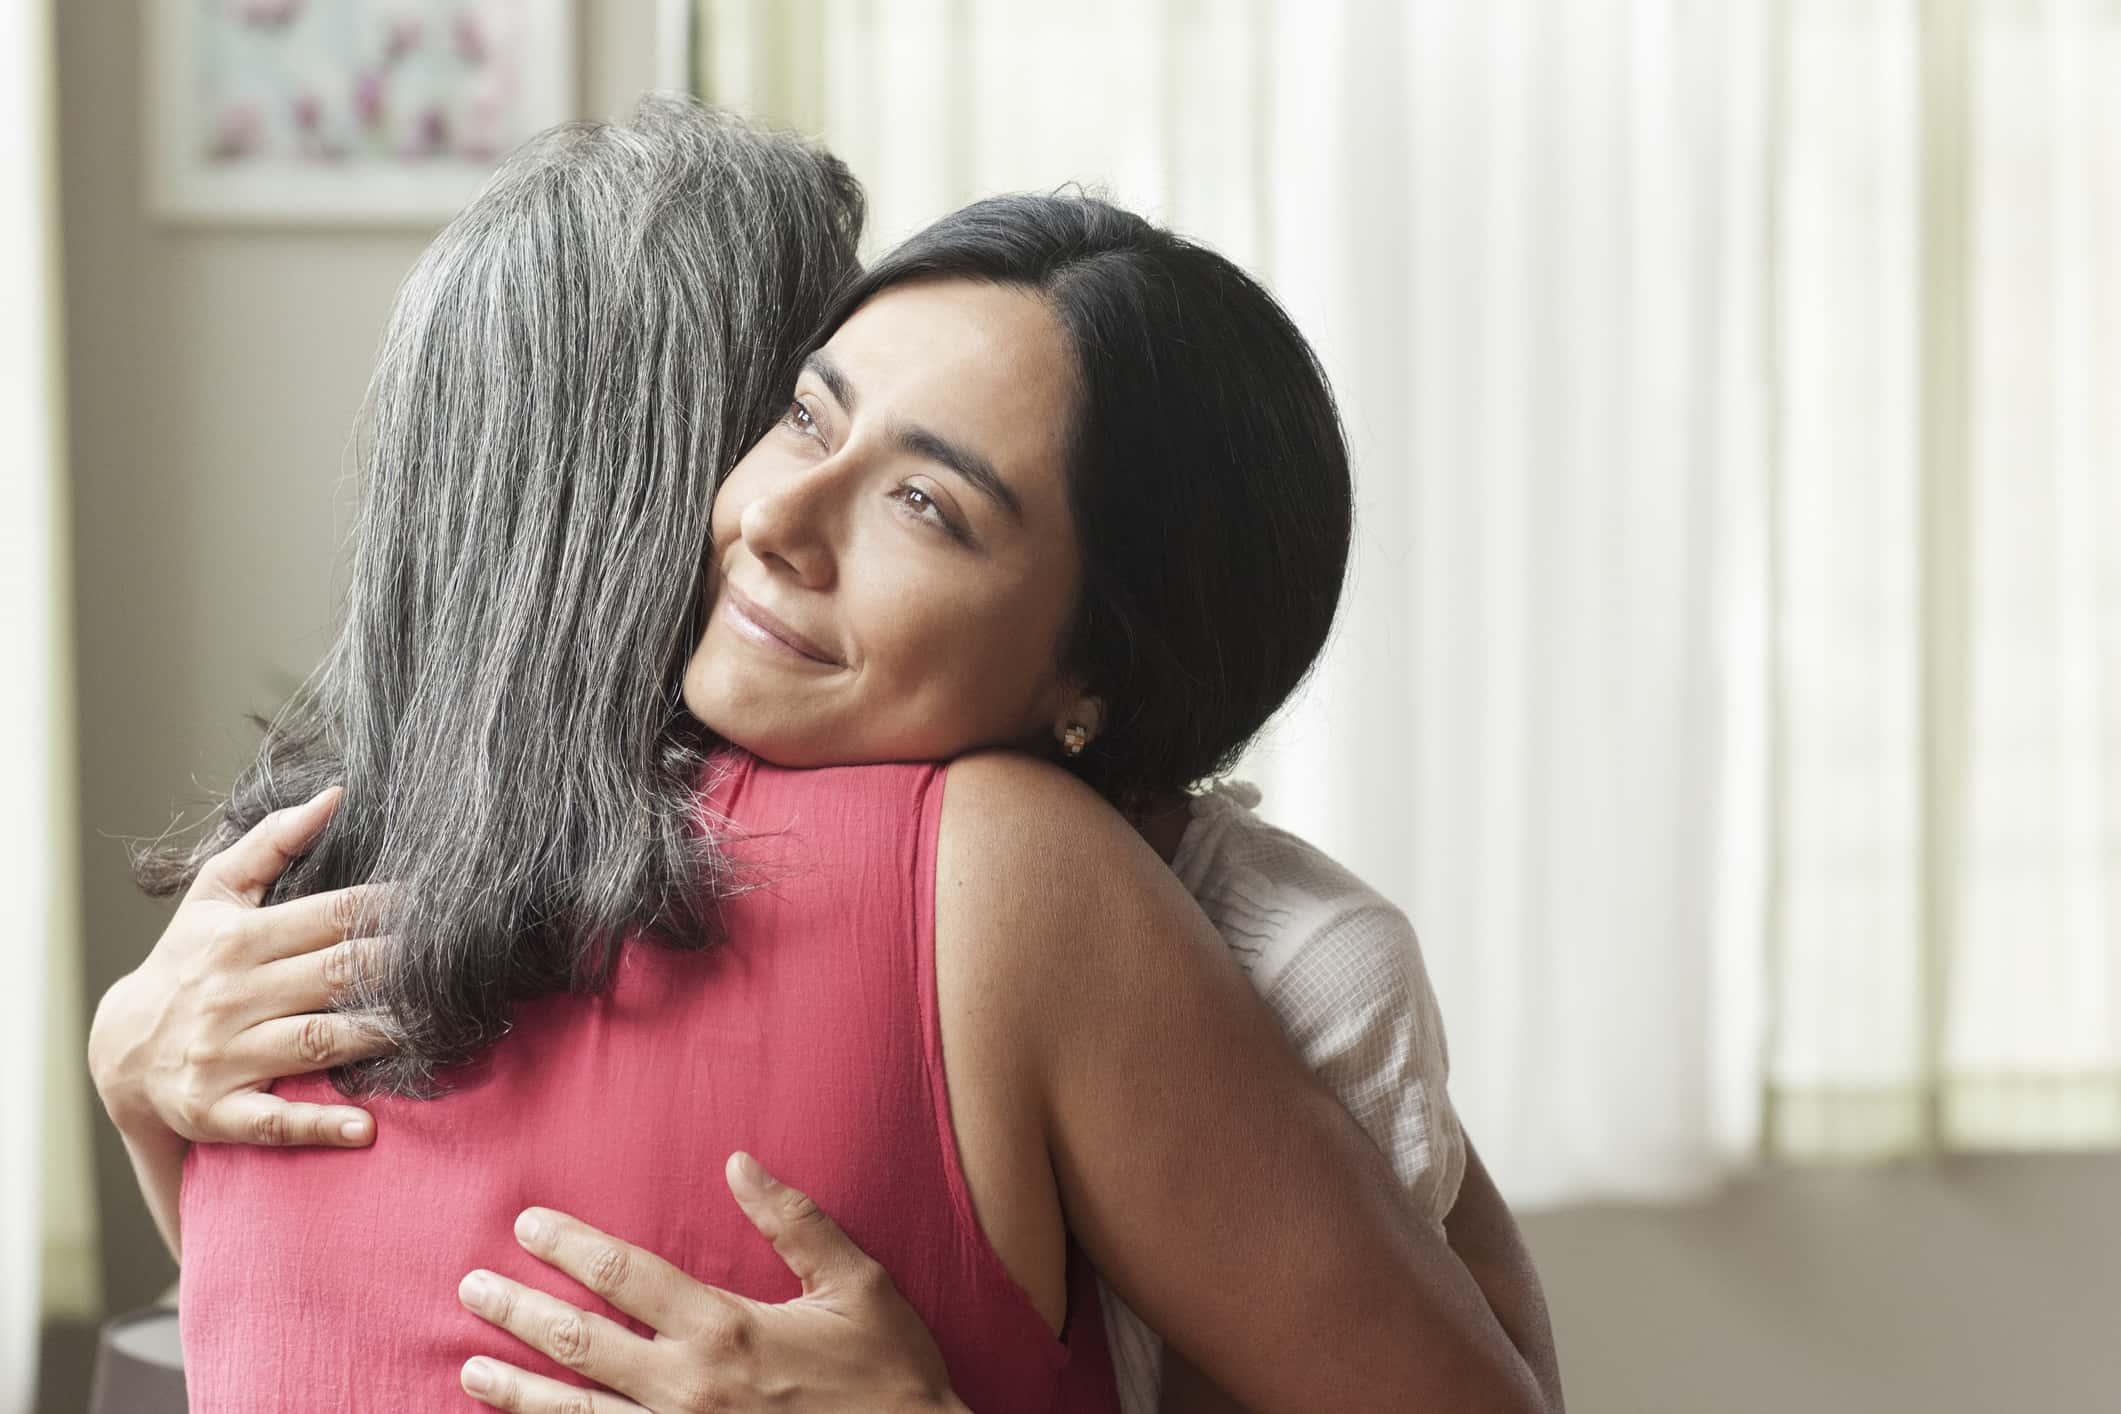 Smiling daughter hugging her mother